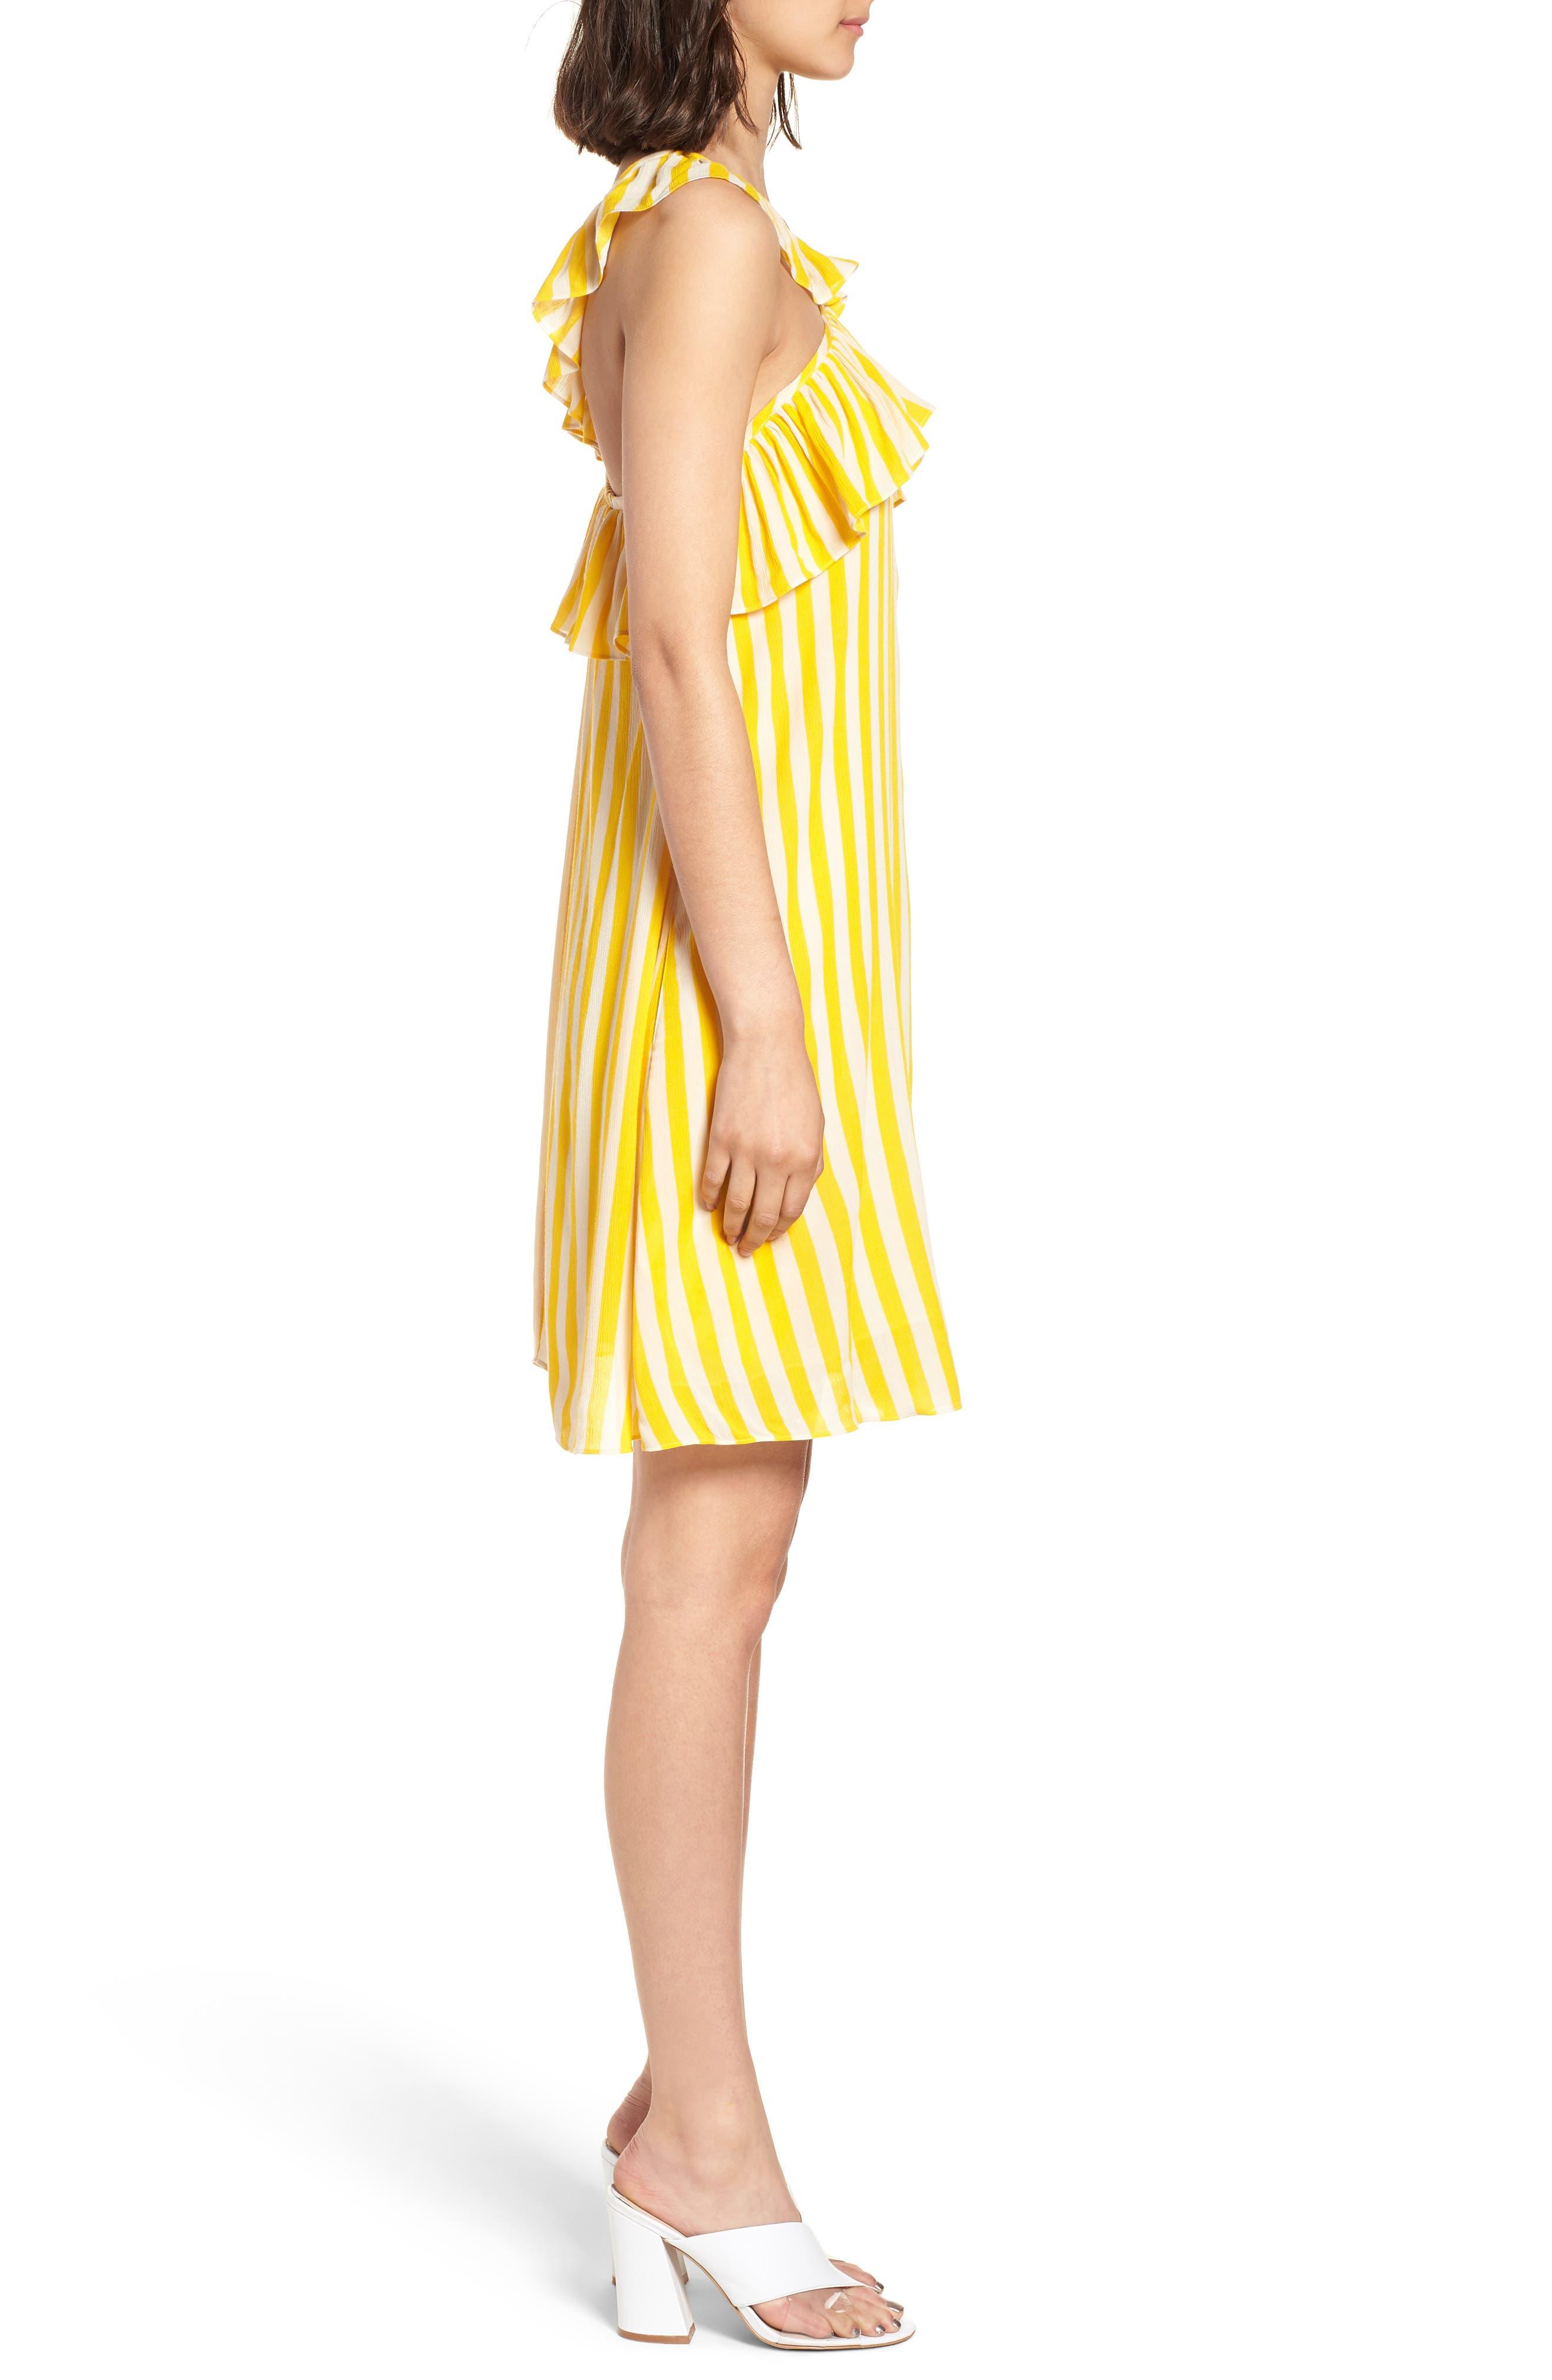 Tinsley Halter Dress,                             Alternate thumbnail 3, color,                             YELLOW STRIPE